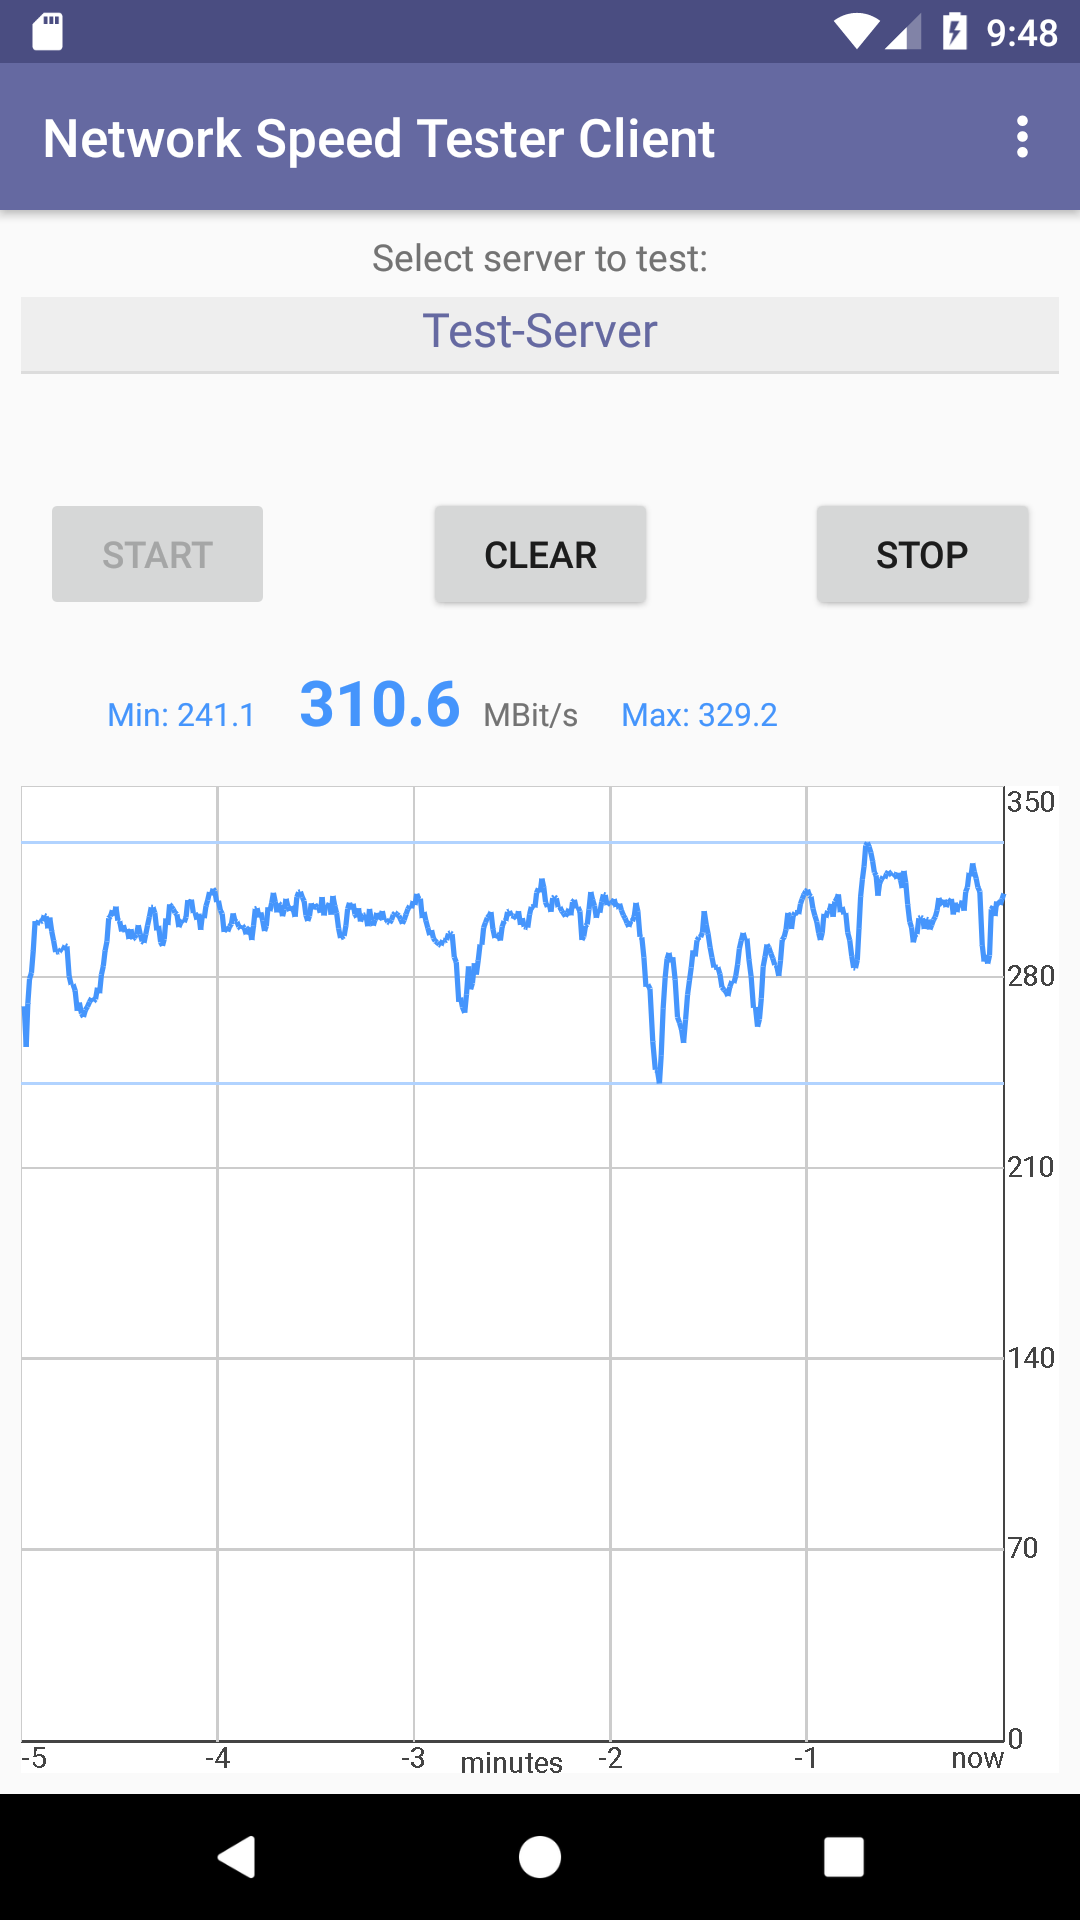 Network Speed Tester - Lakehorn